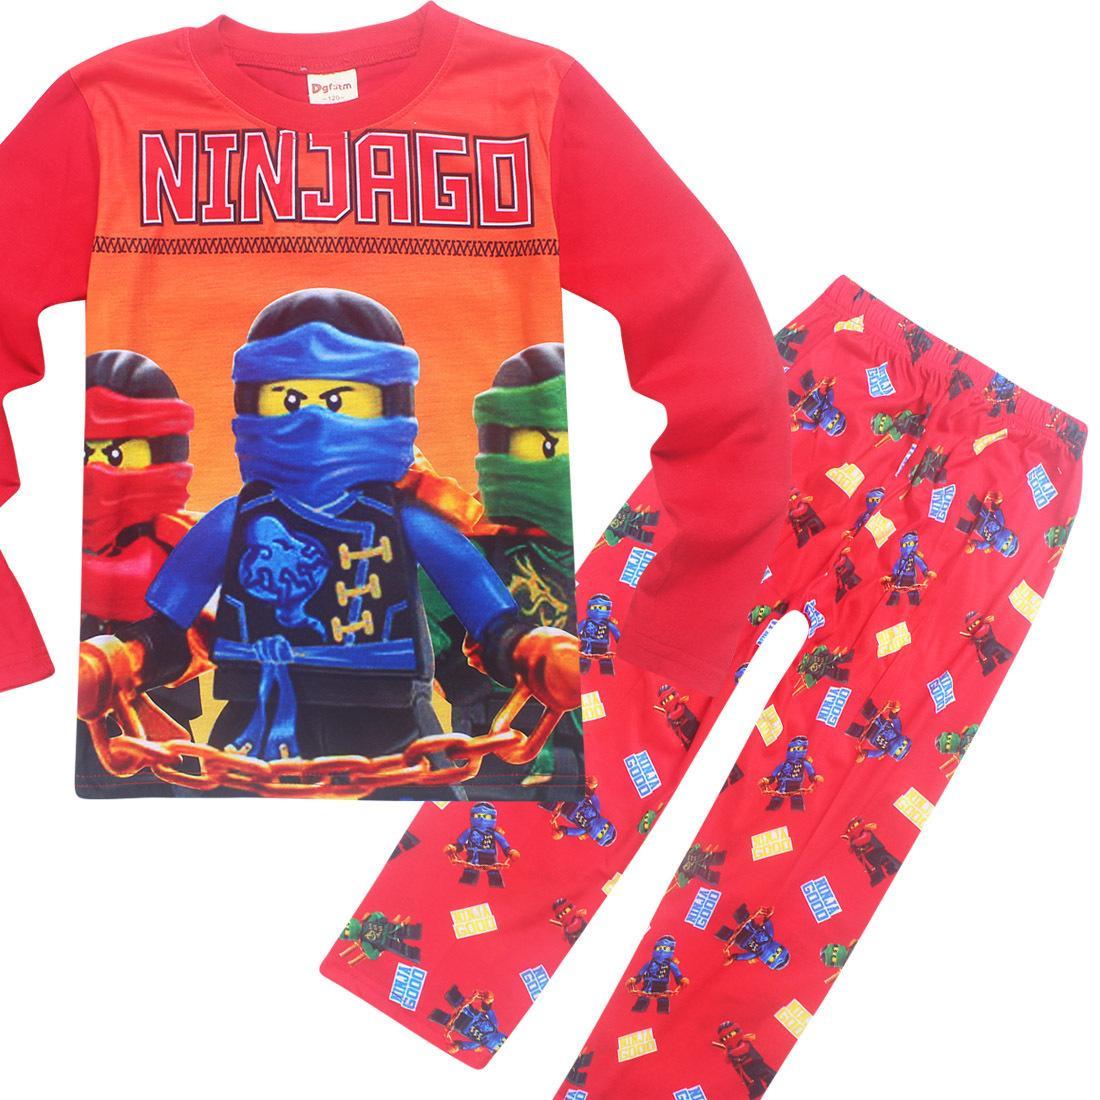 Toddler Kds Boy Ninjago Sleepwear Ninja Christmas Pajamas For Boys Baby Girls Pyjamas Halloween Party Clothing Children Pijamas J190520